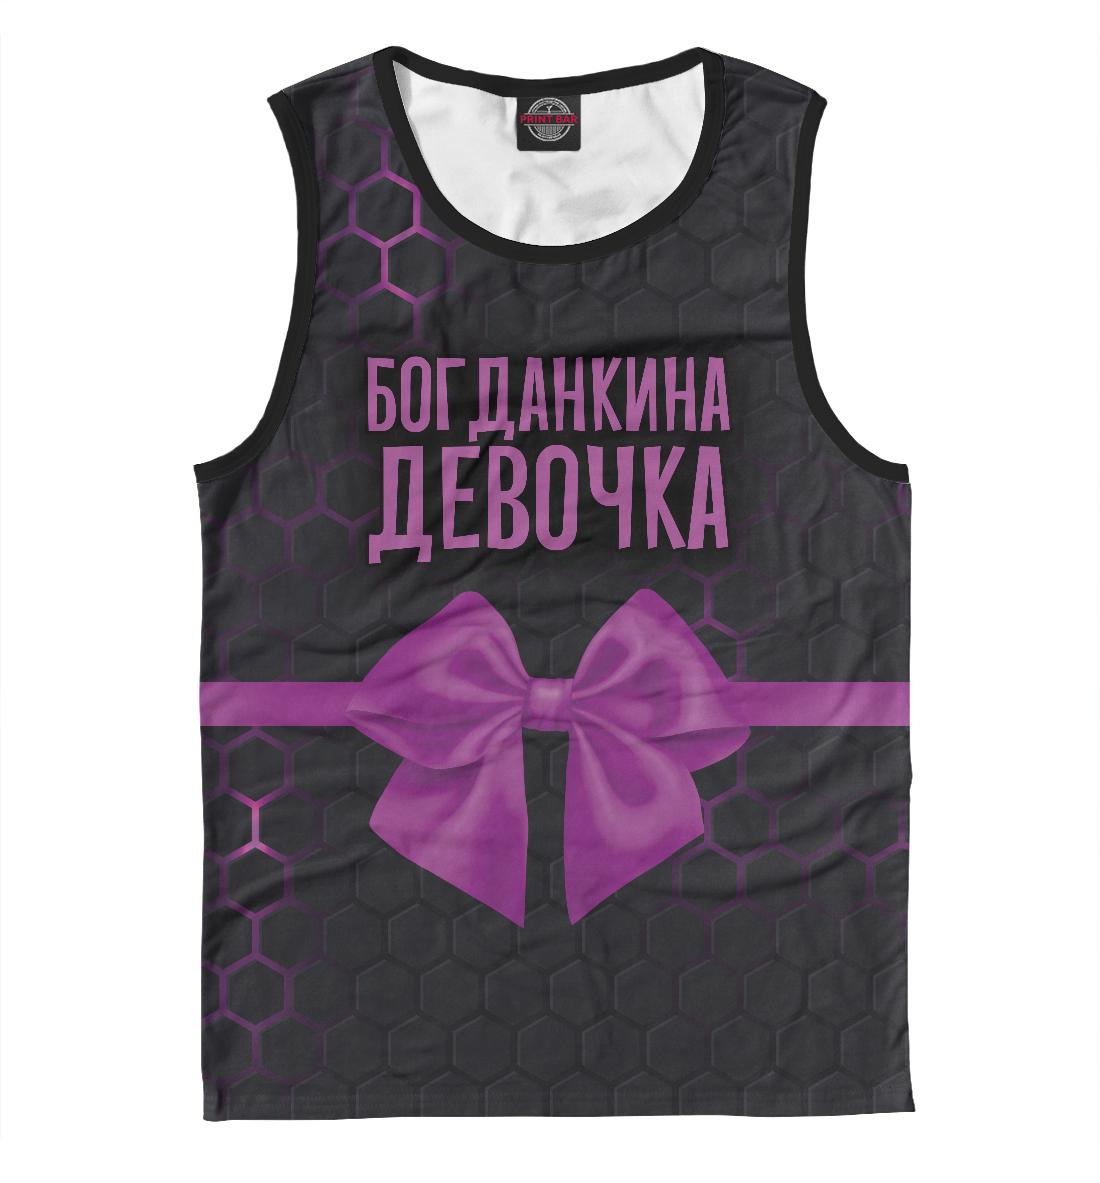 Майка Богданкина девочка